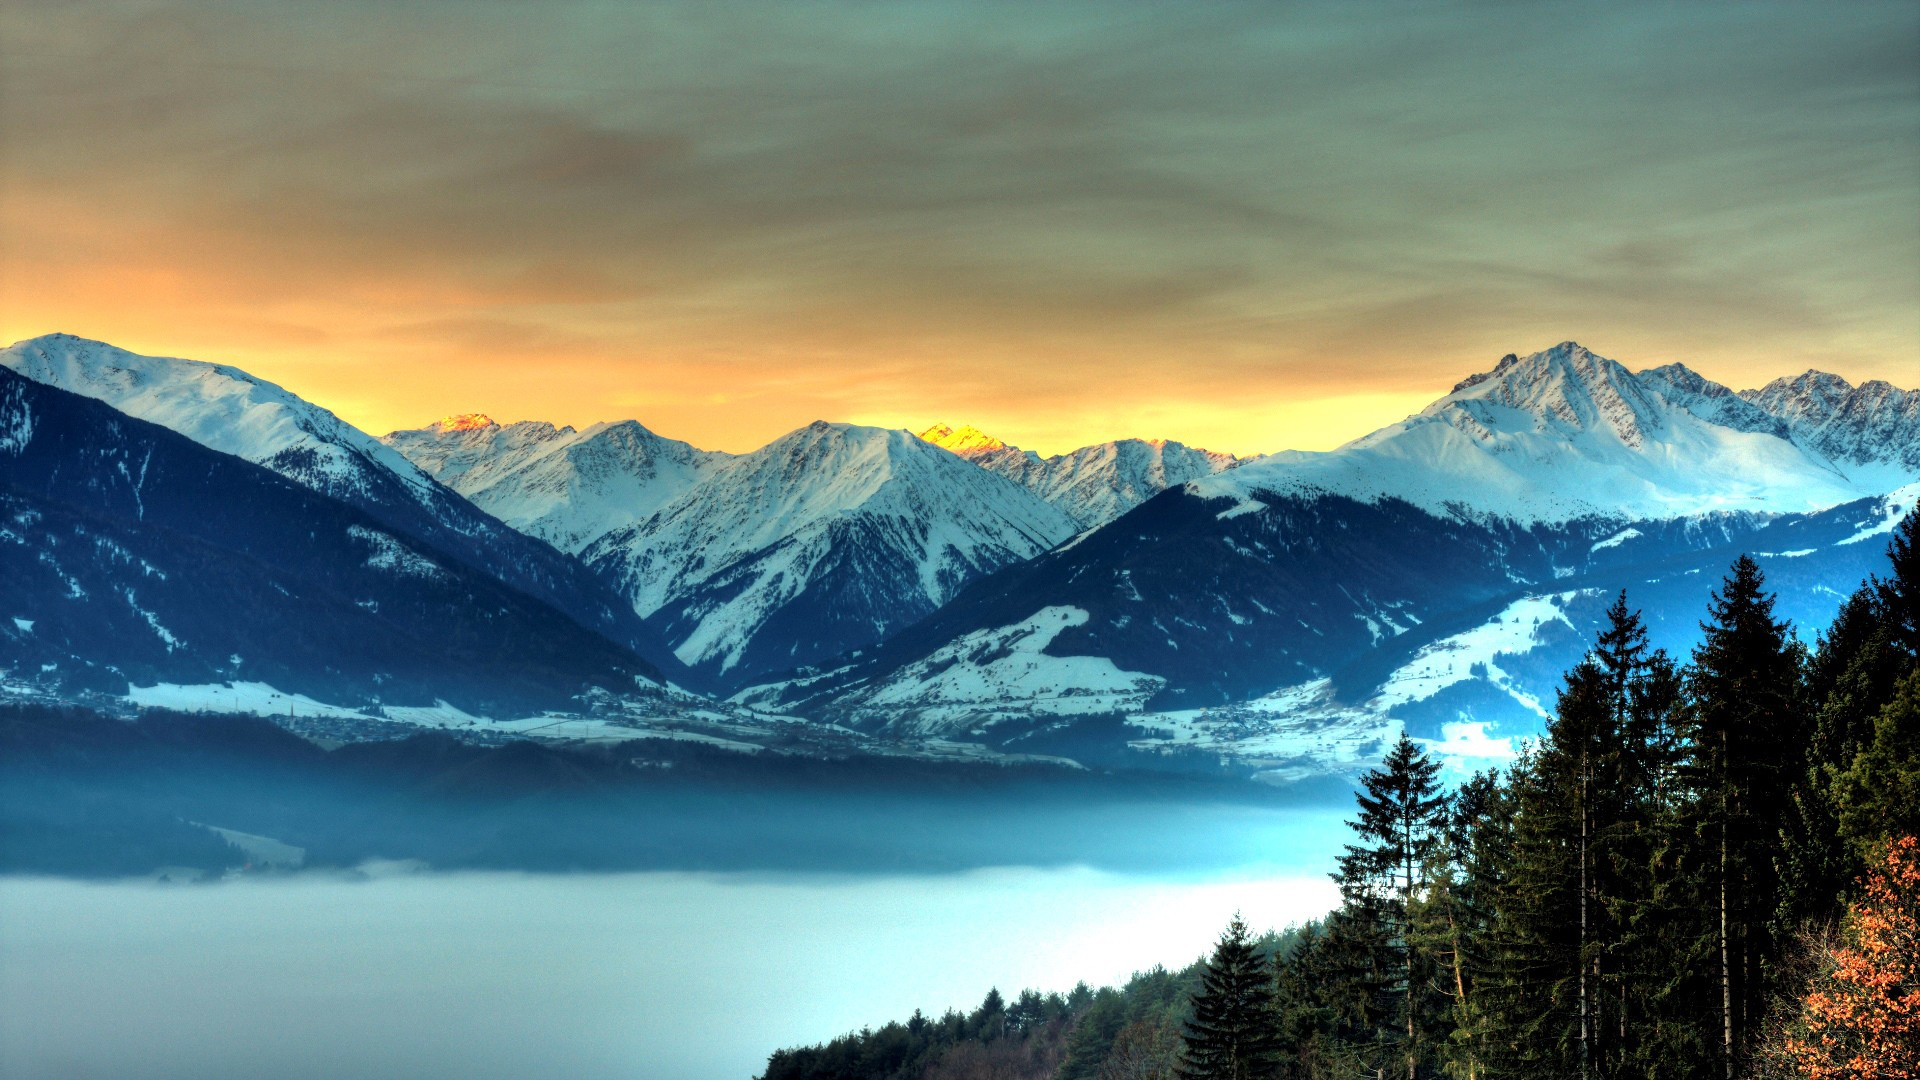 Beautiful-Snowy-Mountain-Wallpaper-HD